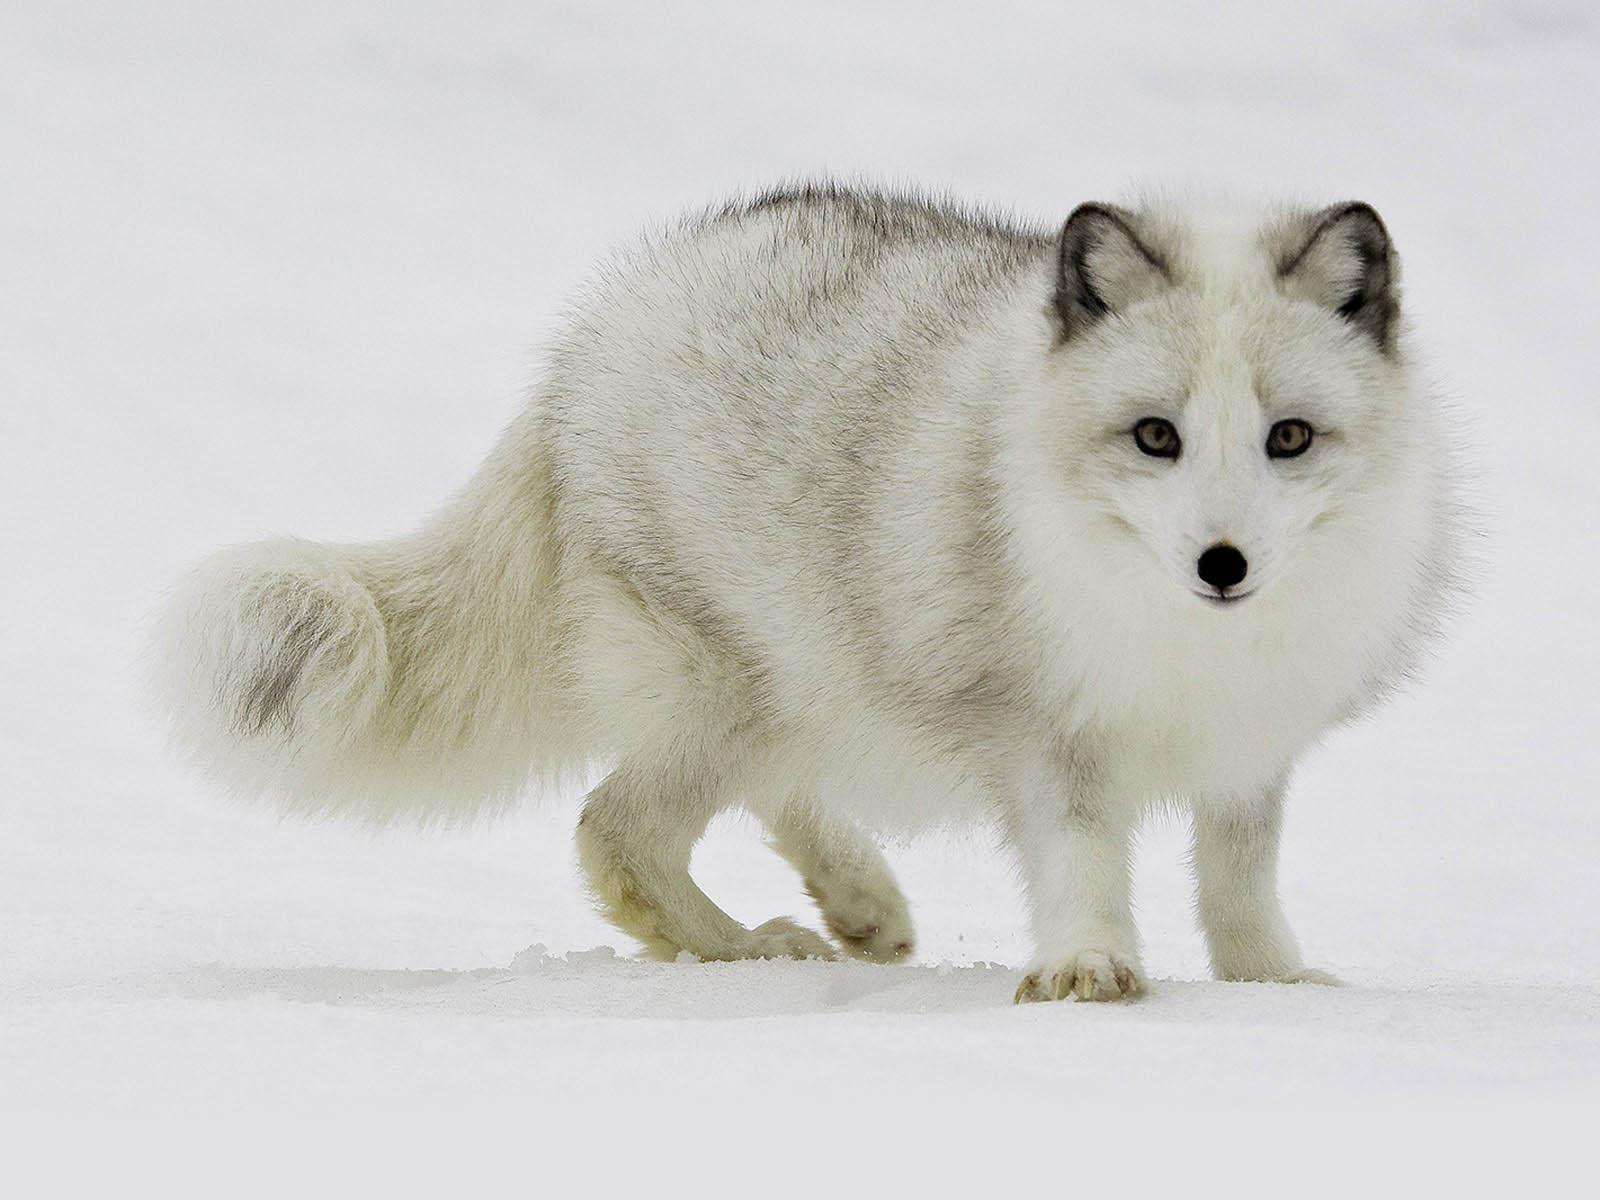 Polar Fox clipart artic Arctic Arctic family photo#15 fox